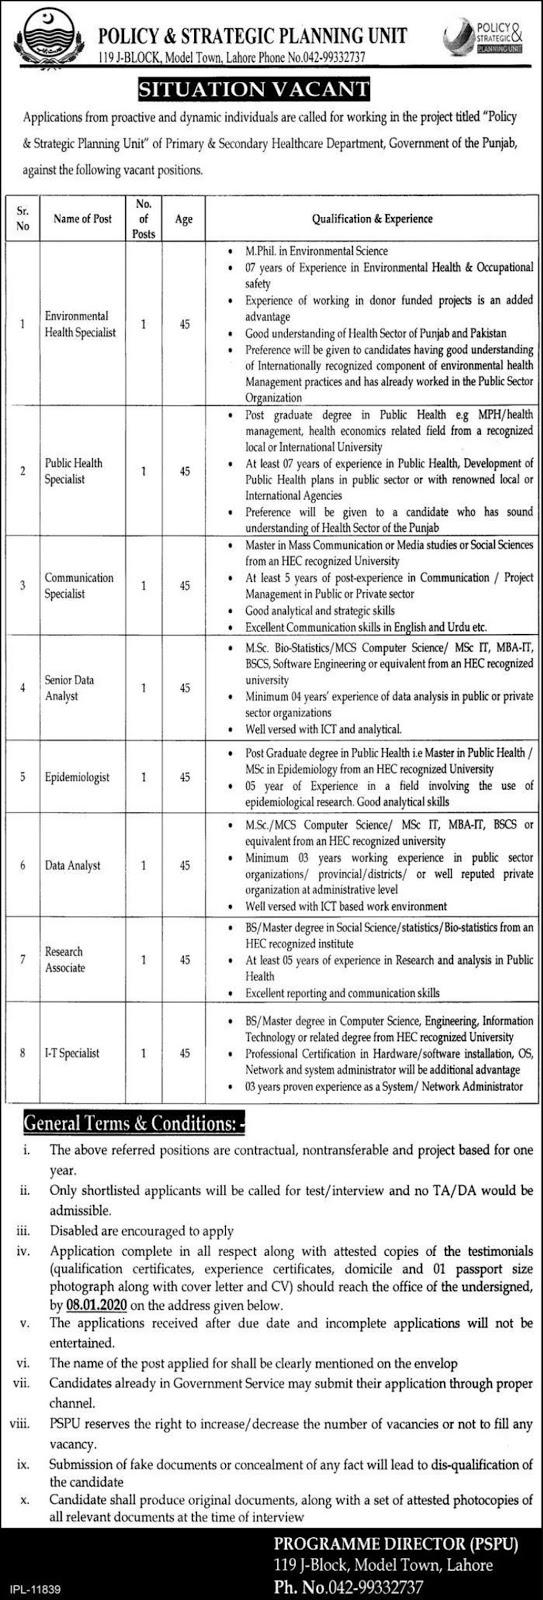 Policy & Strategic Planning Unit Punjab Jobs